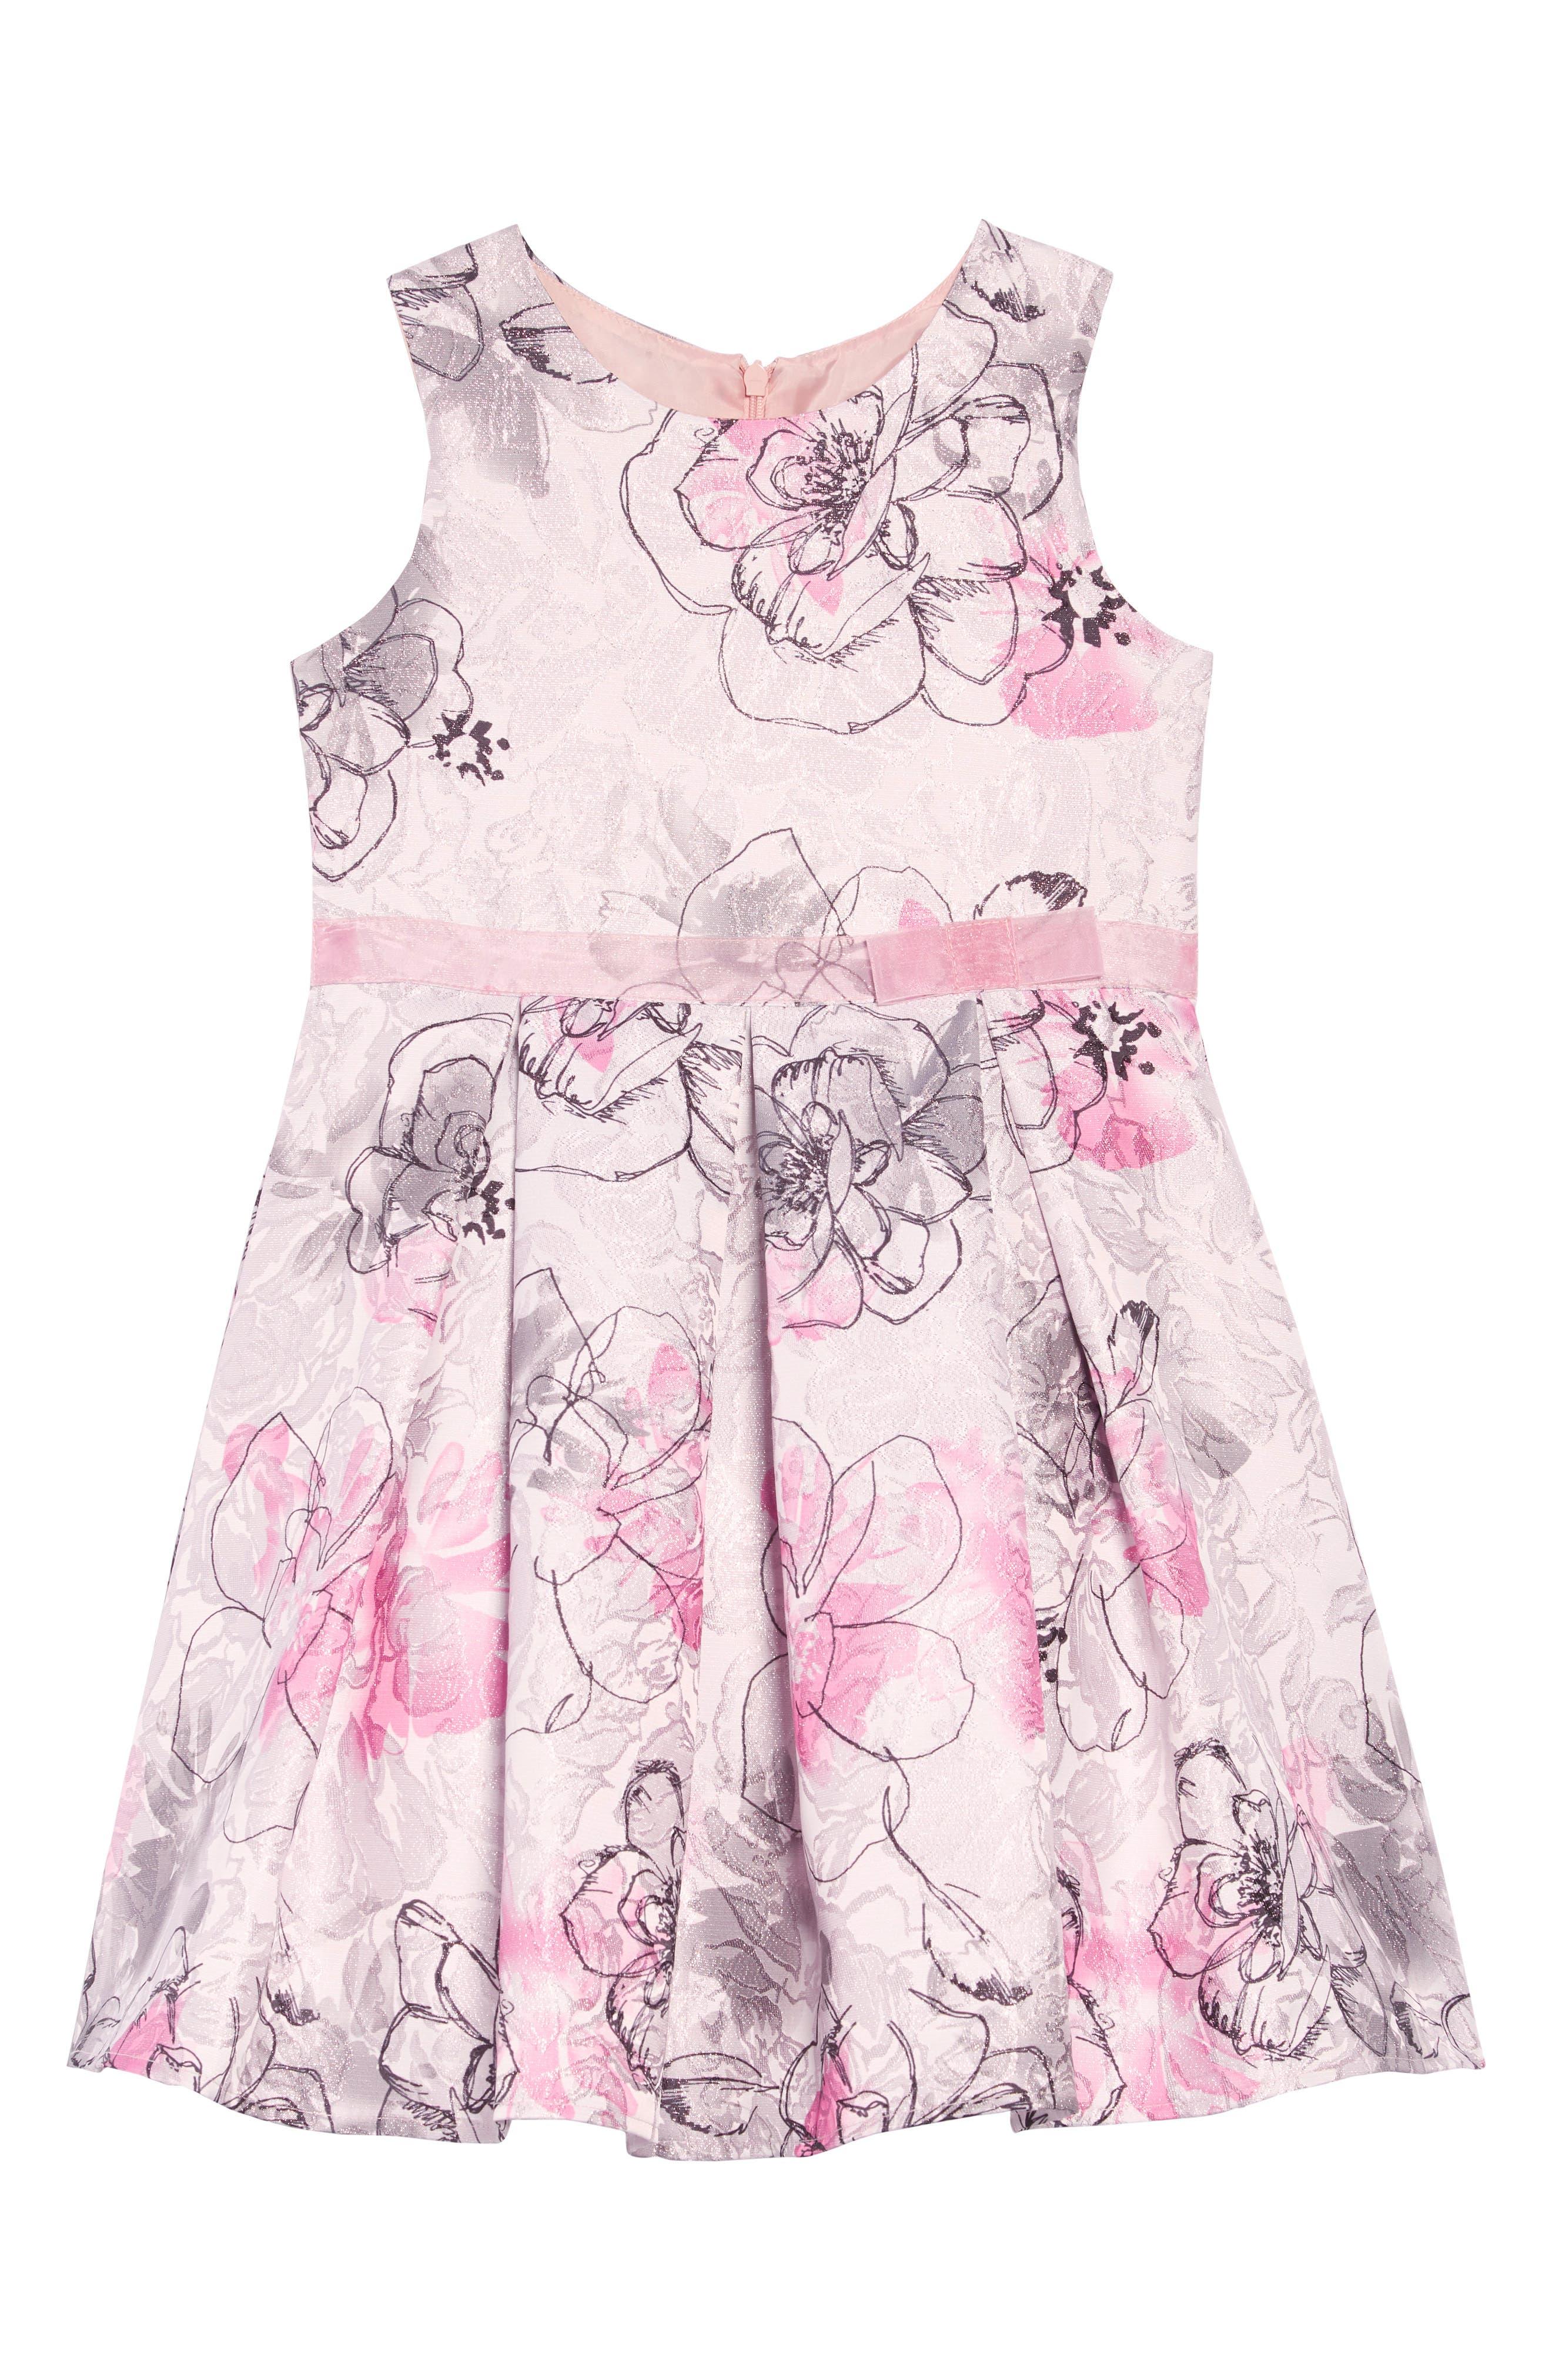 Jacquard Floral Dress,                             Main thumbnail 1, color,                             650